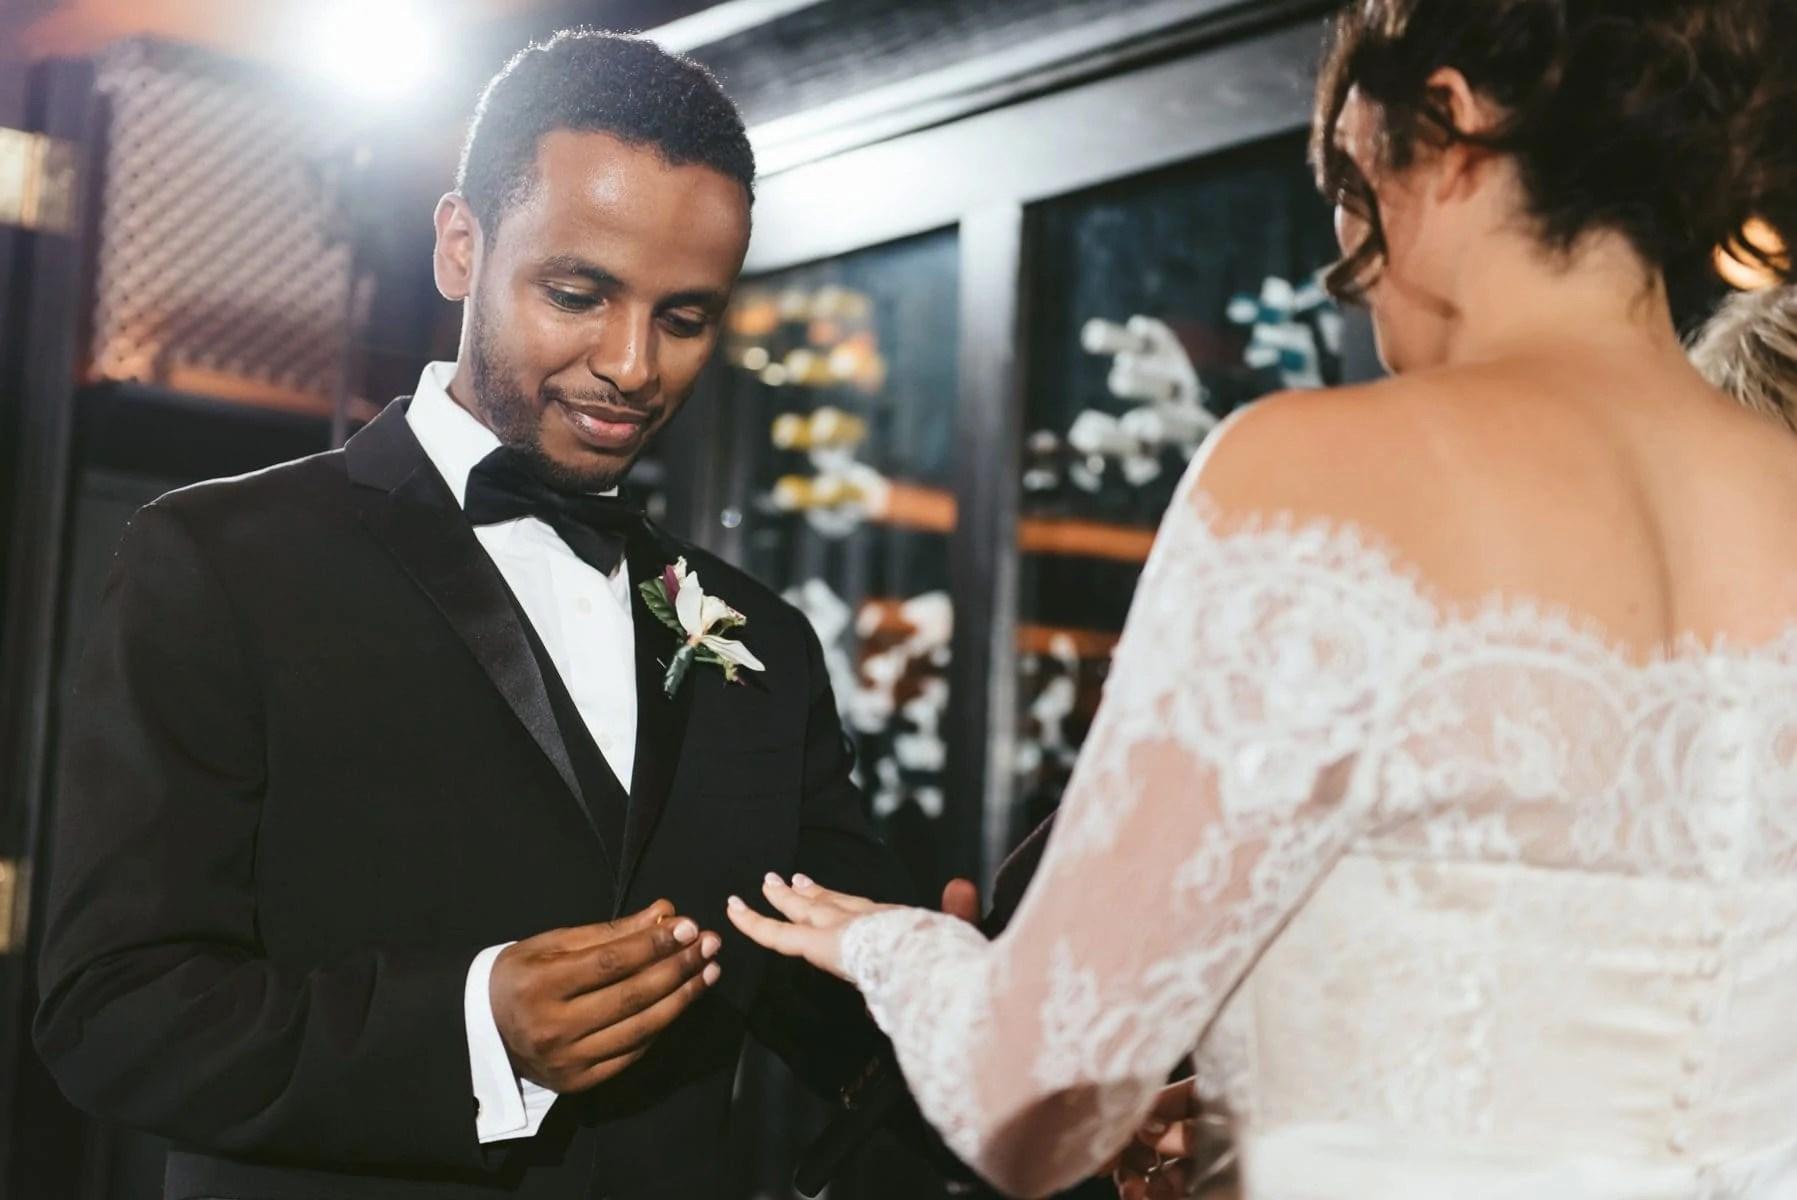 Del posto Restaurant wedding - Manhattan wedding photographer